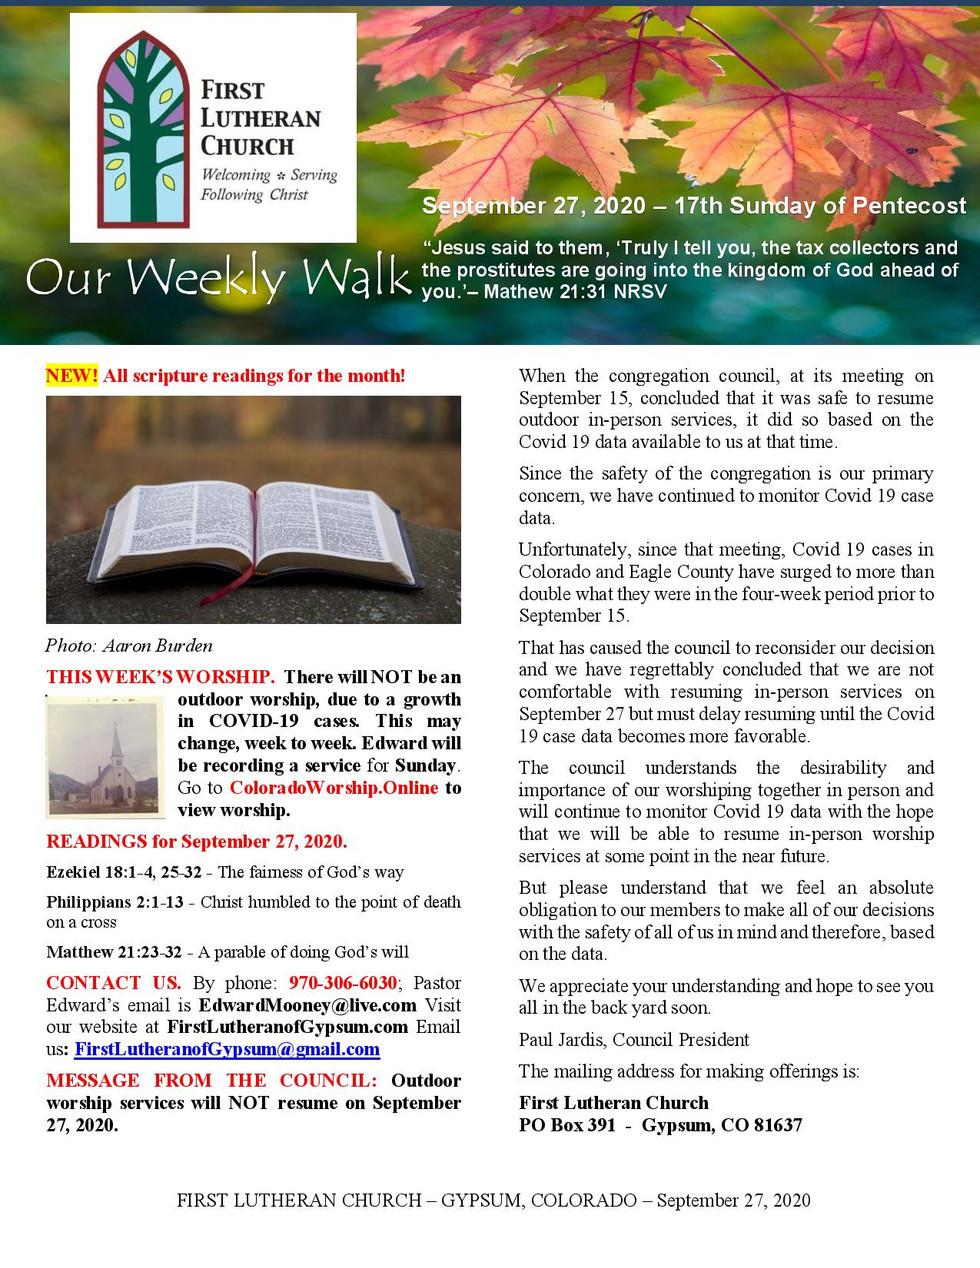 Newsletter, September 27, 2020, page 1